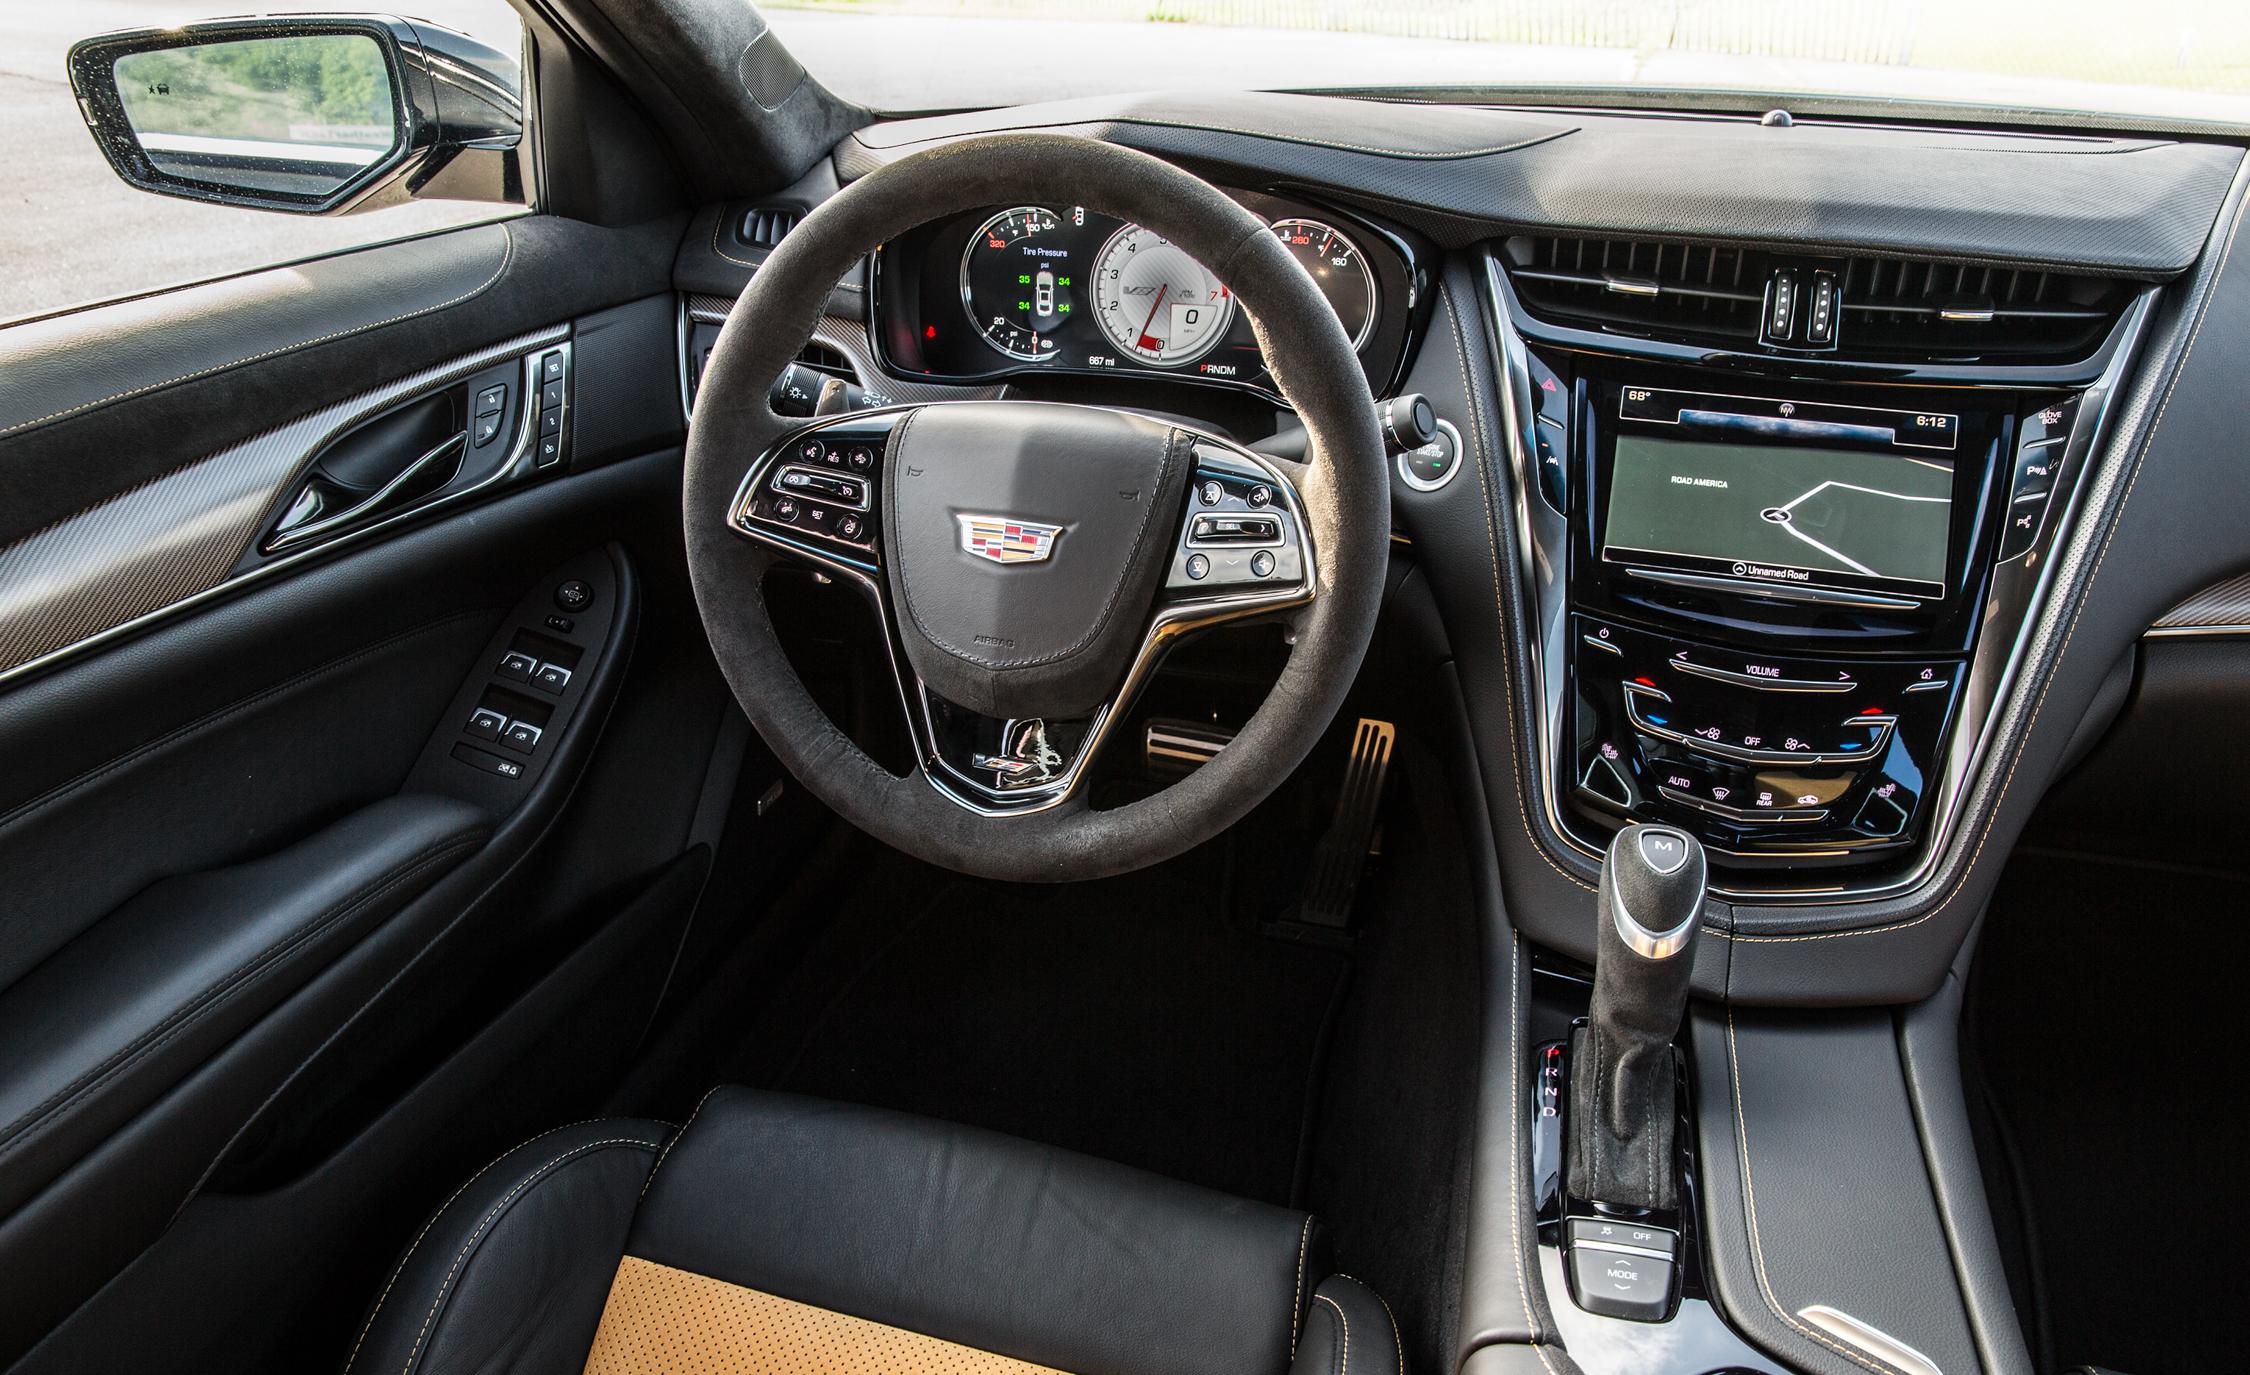 2016 Cadillac CTS-V Interior Cockpit